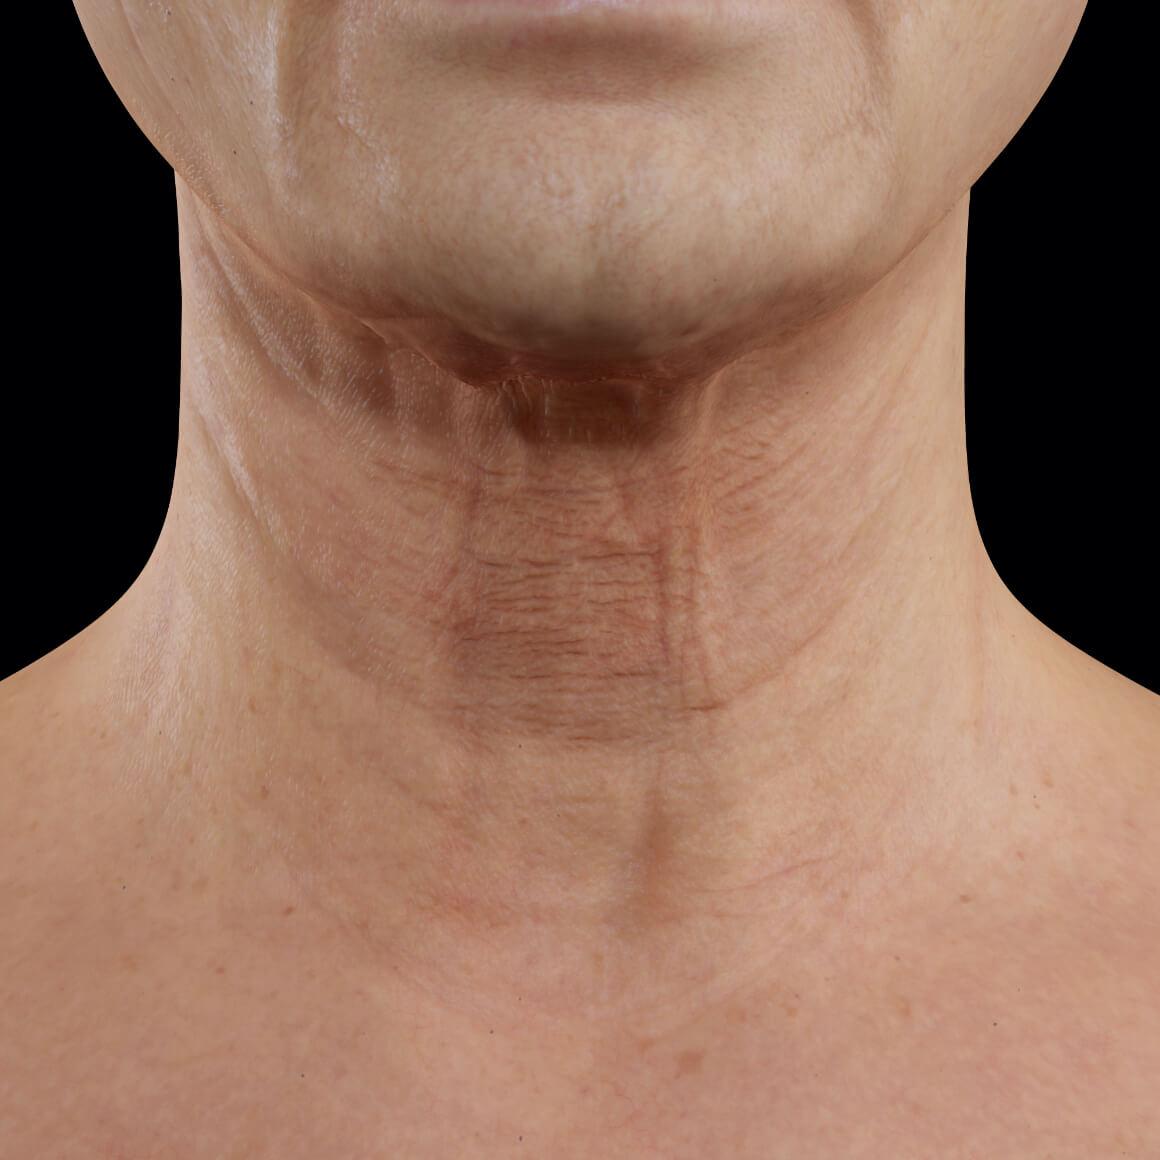 Clinique Chloé female patient facing front showing neck skin laxity